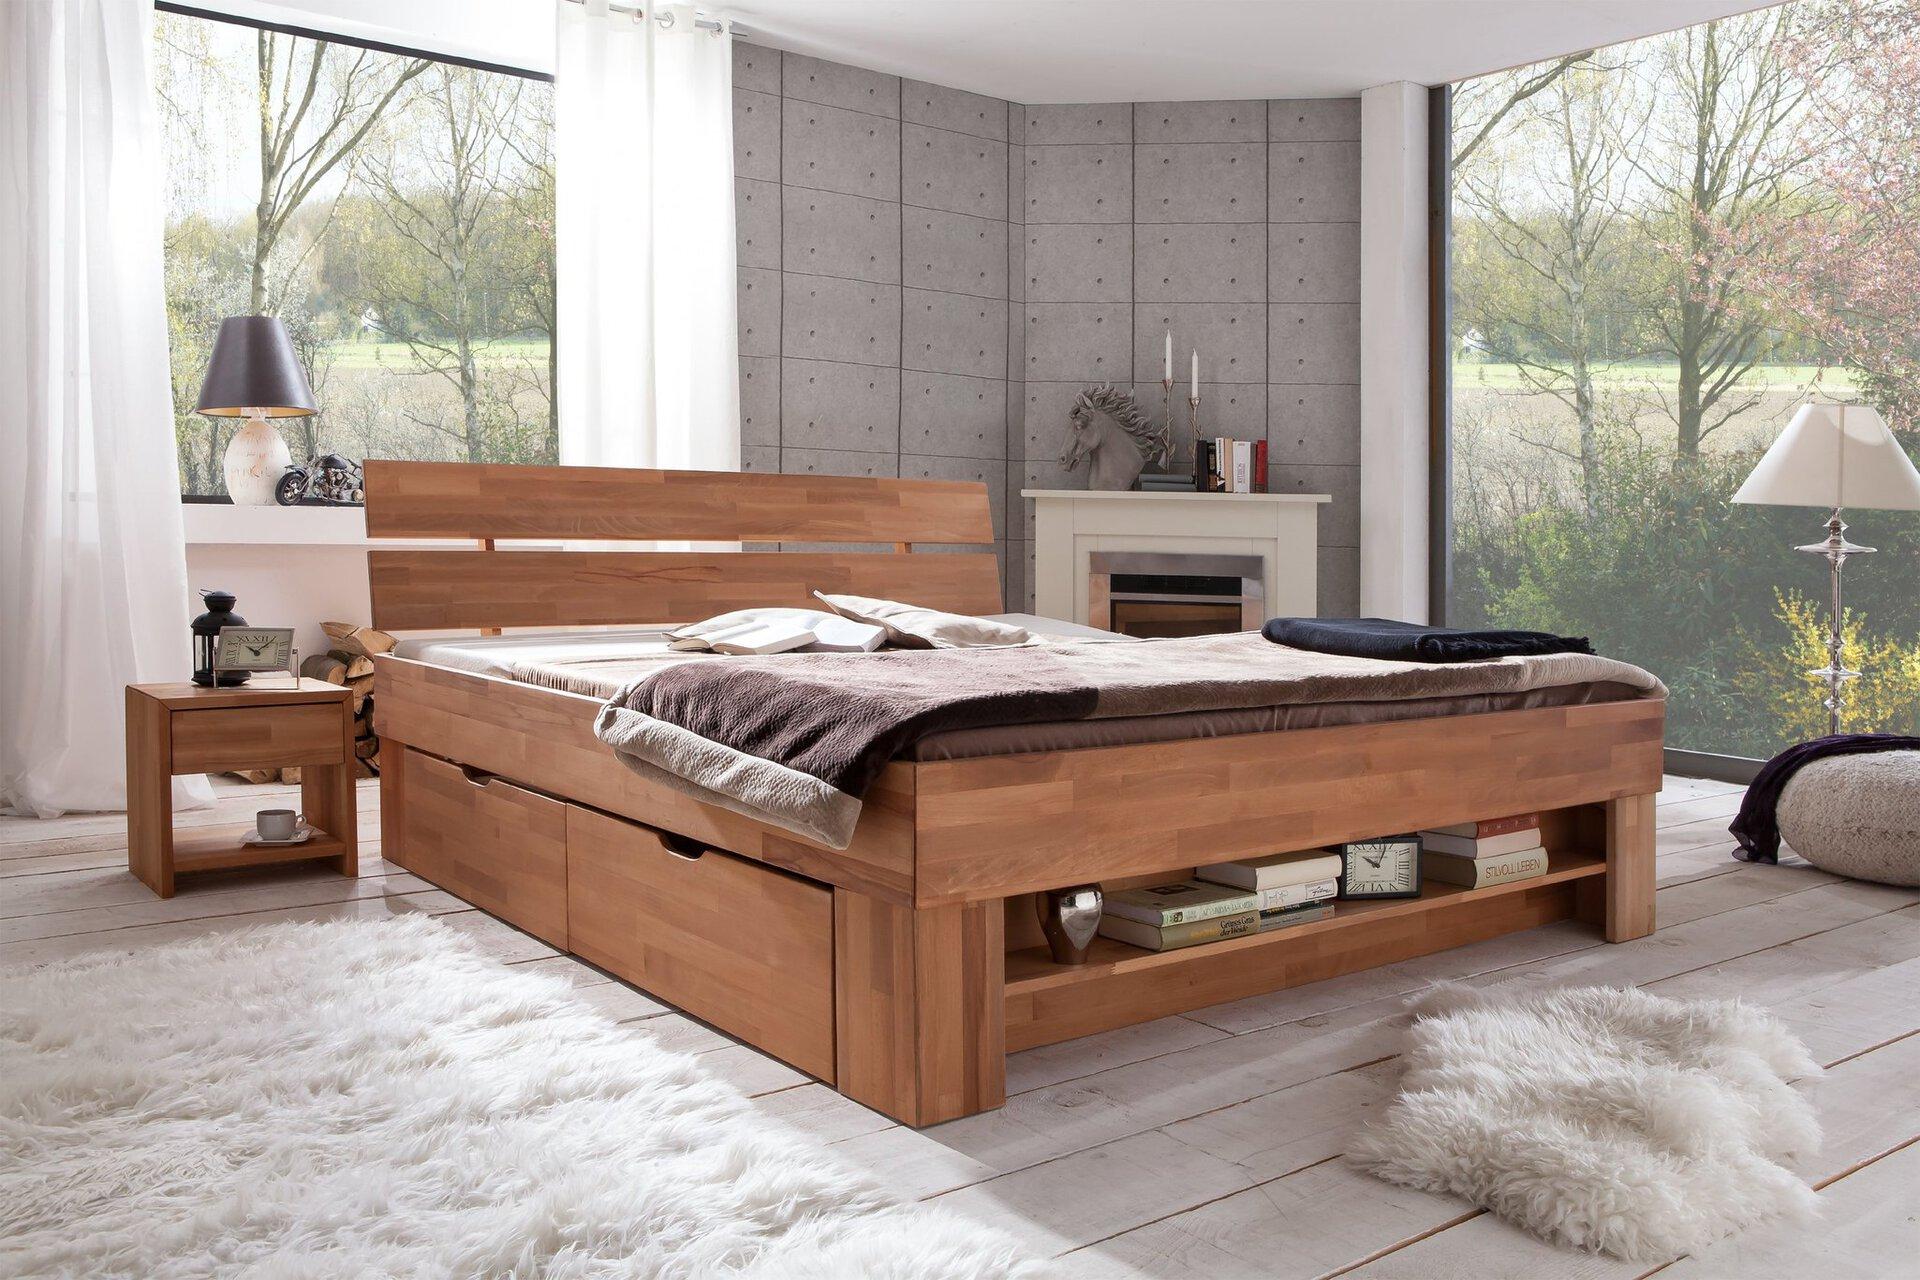 Bett SOFIE SO-180 Dreamoro Holz braun 215 x 88 x 185 cm